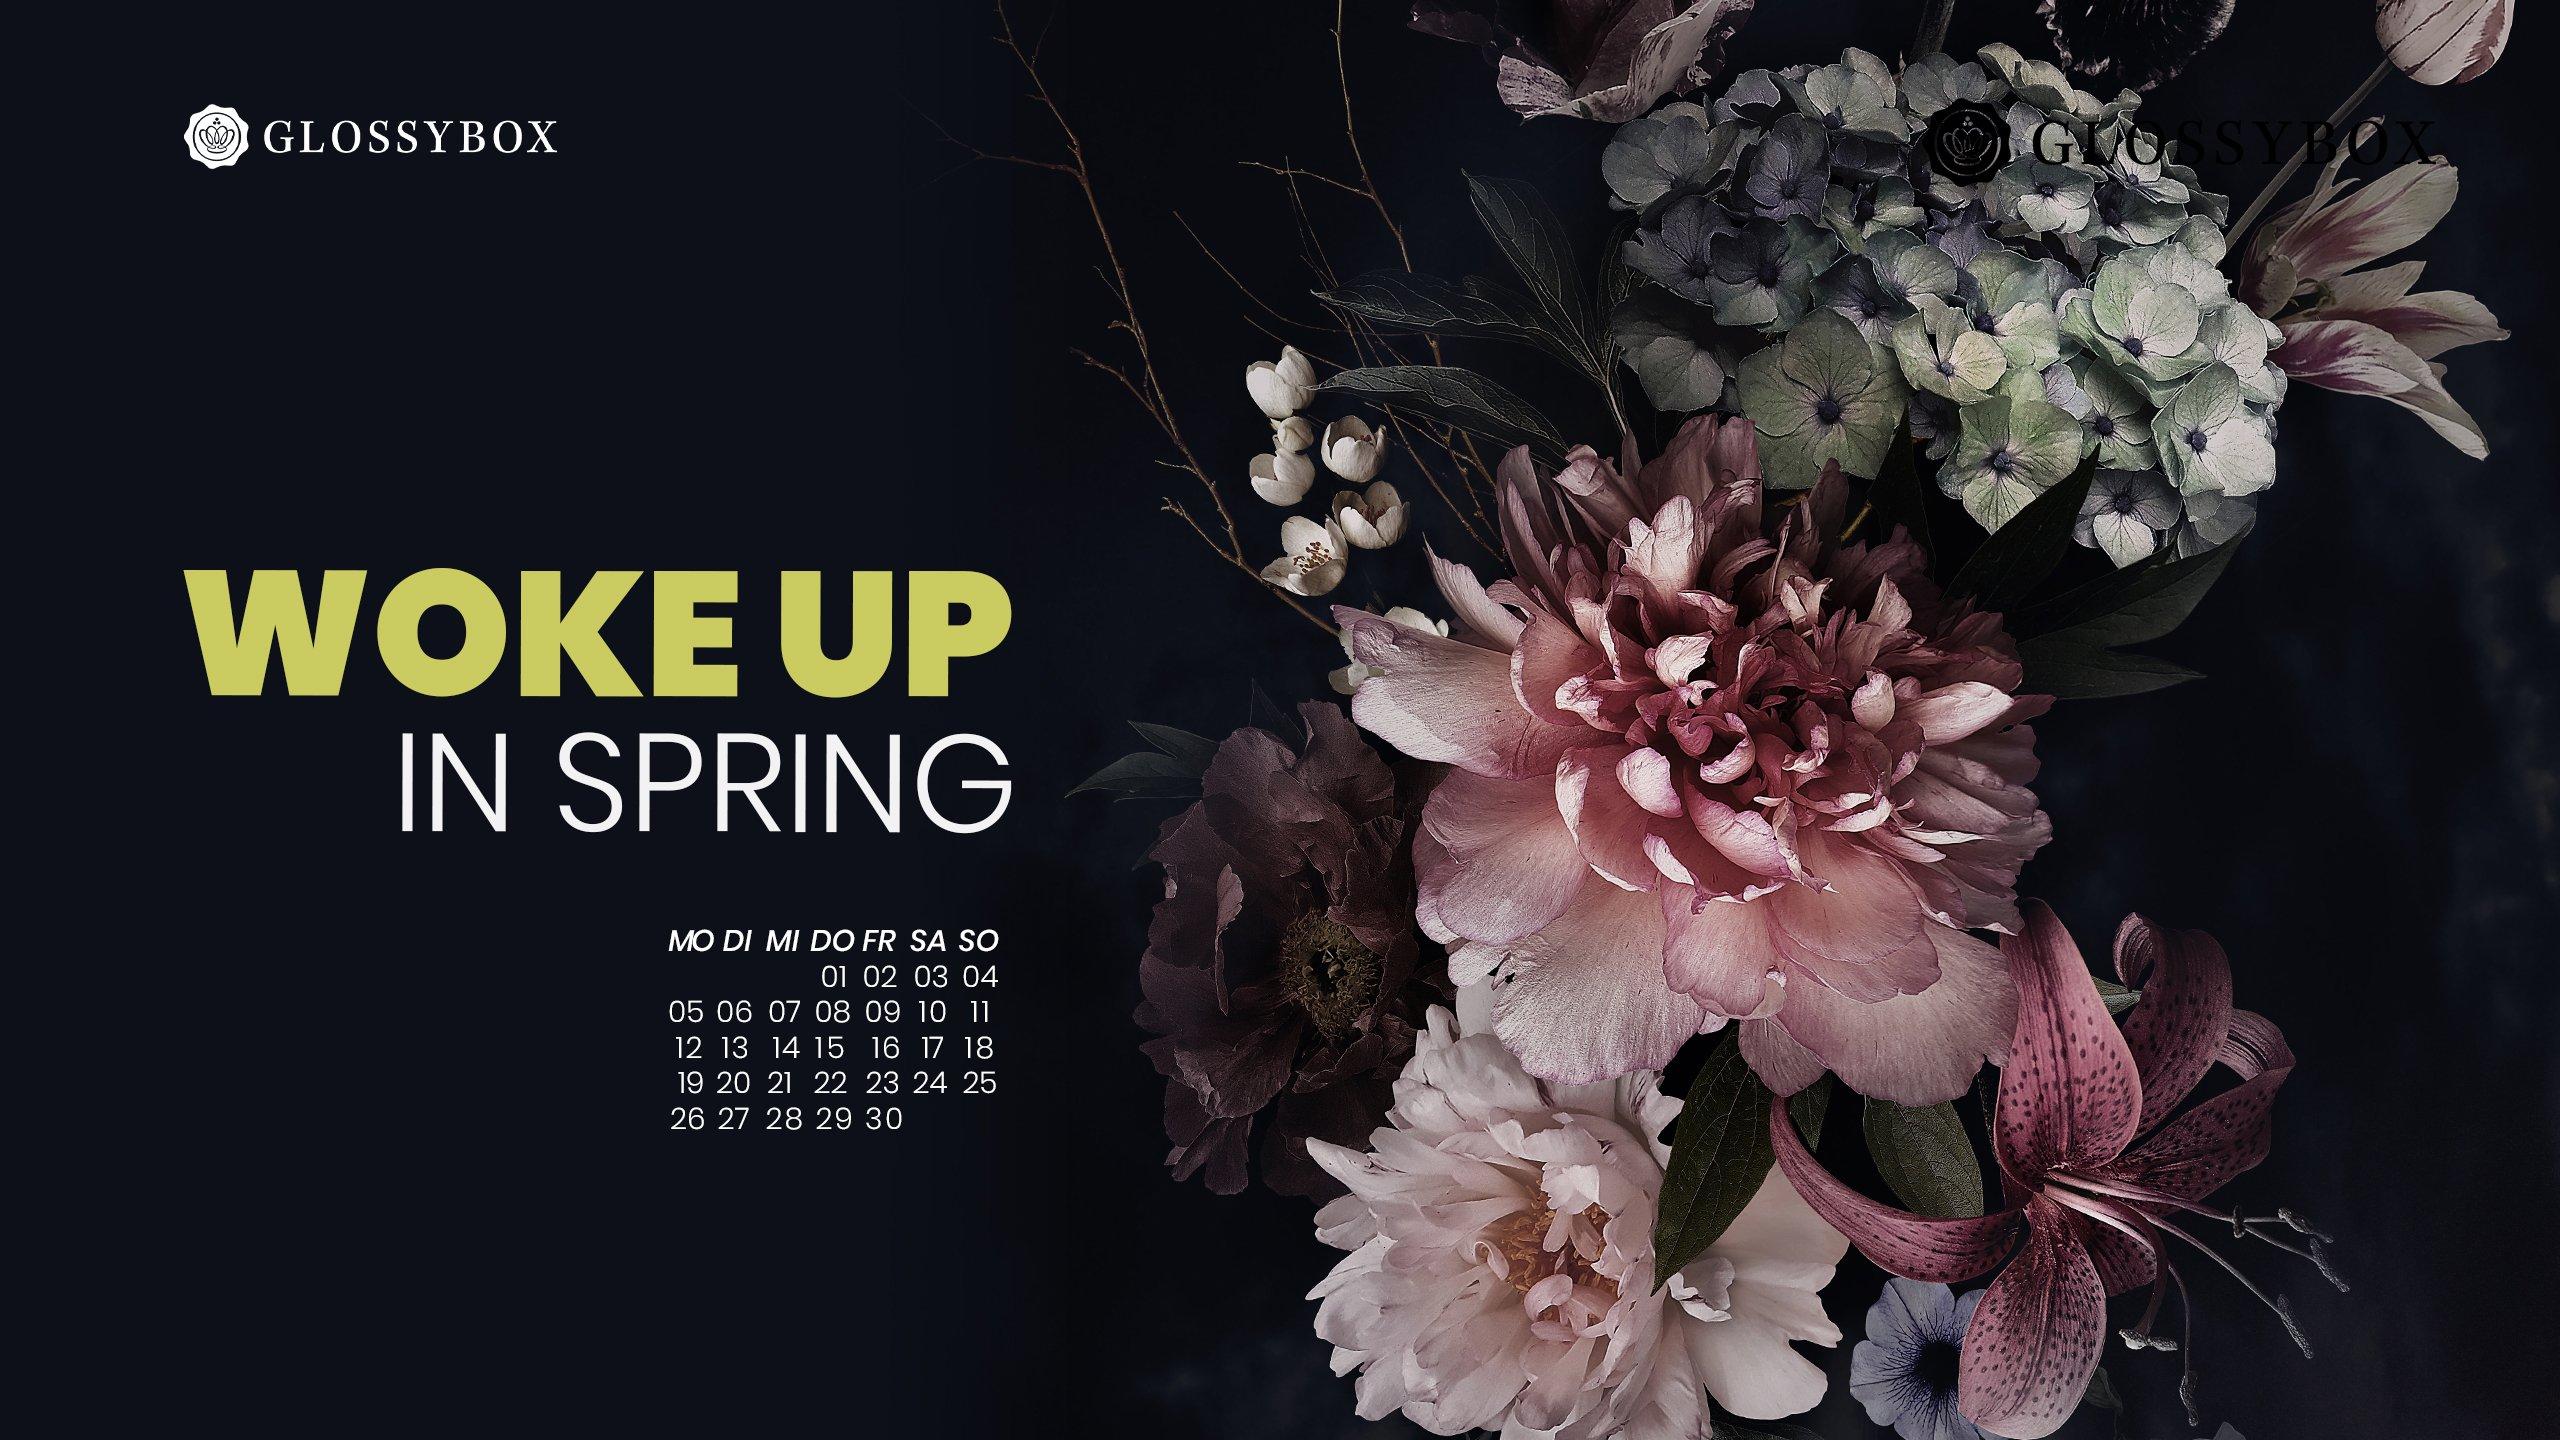 glossybox-wallpaper-gratis-april-screensaver-pc-smartphone-herunterladen